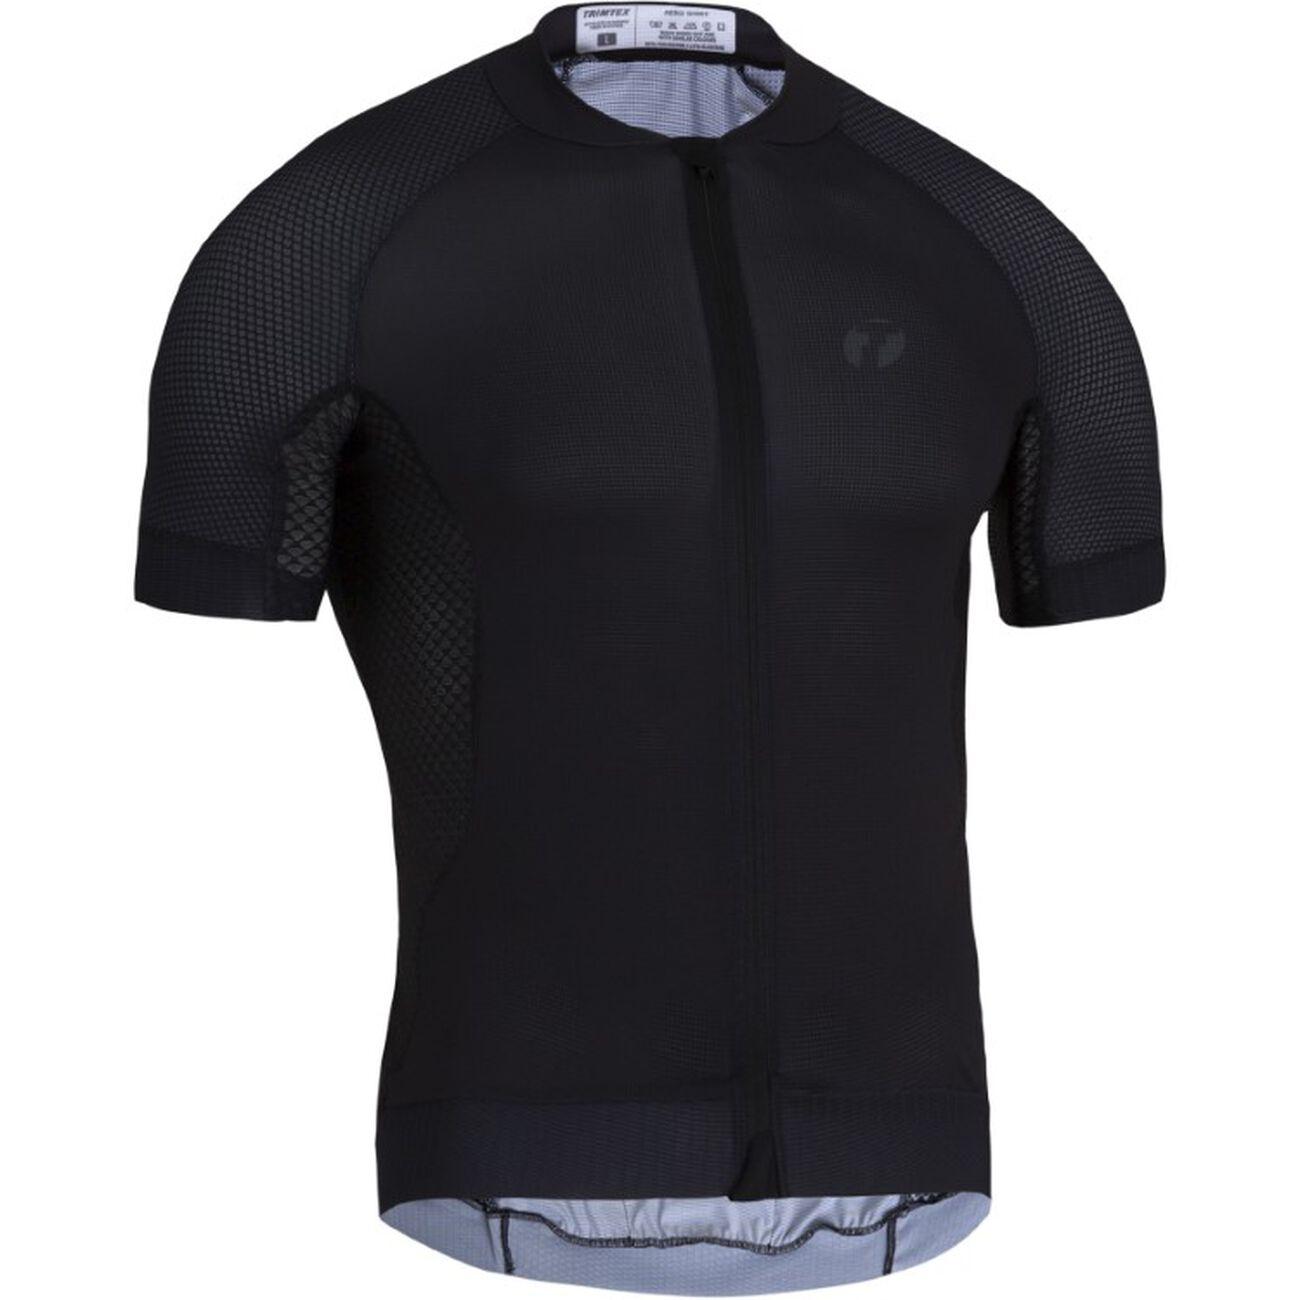 Aero Shirt SS